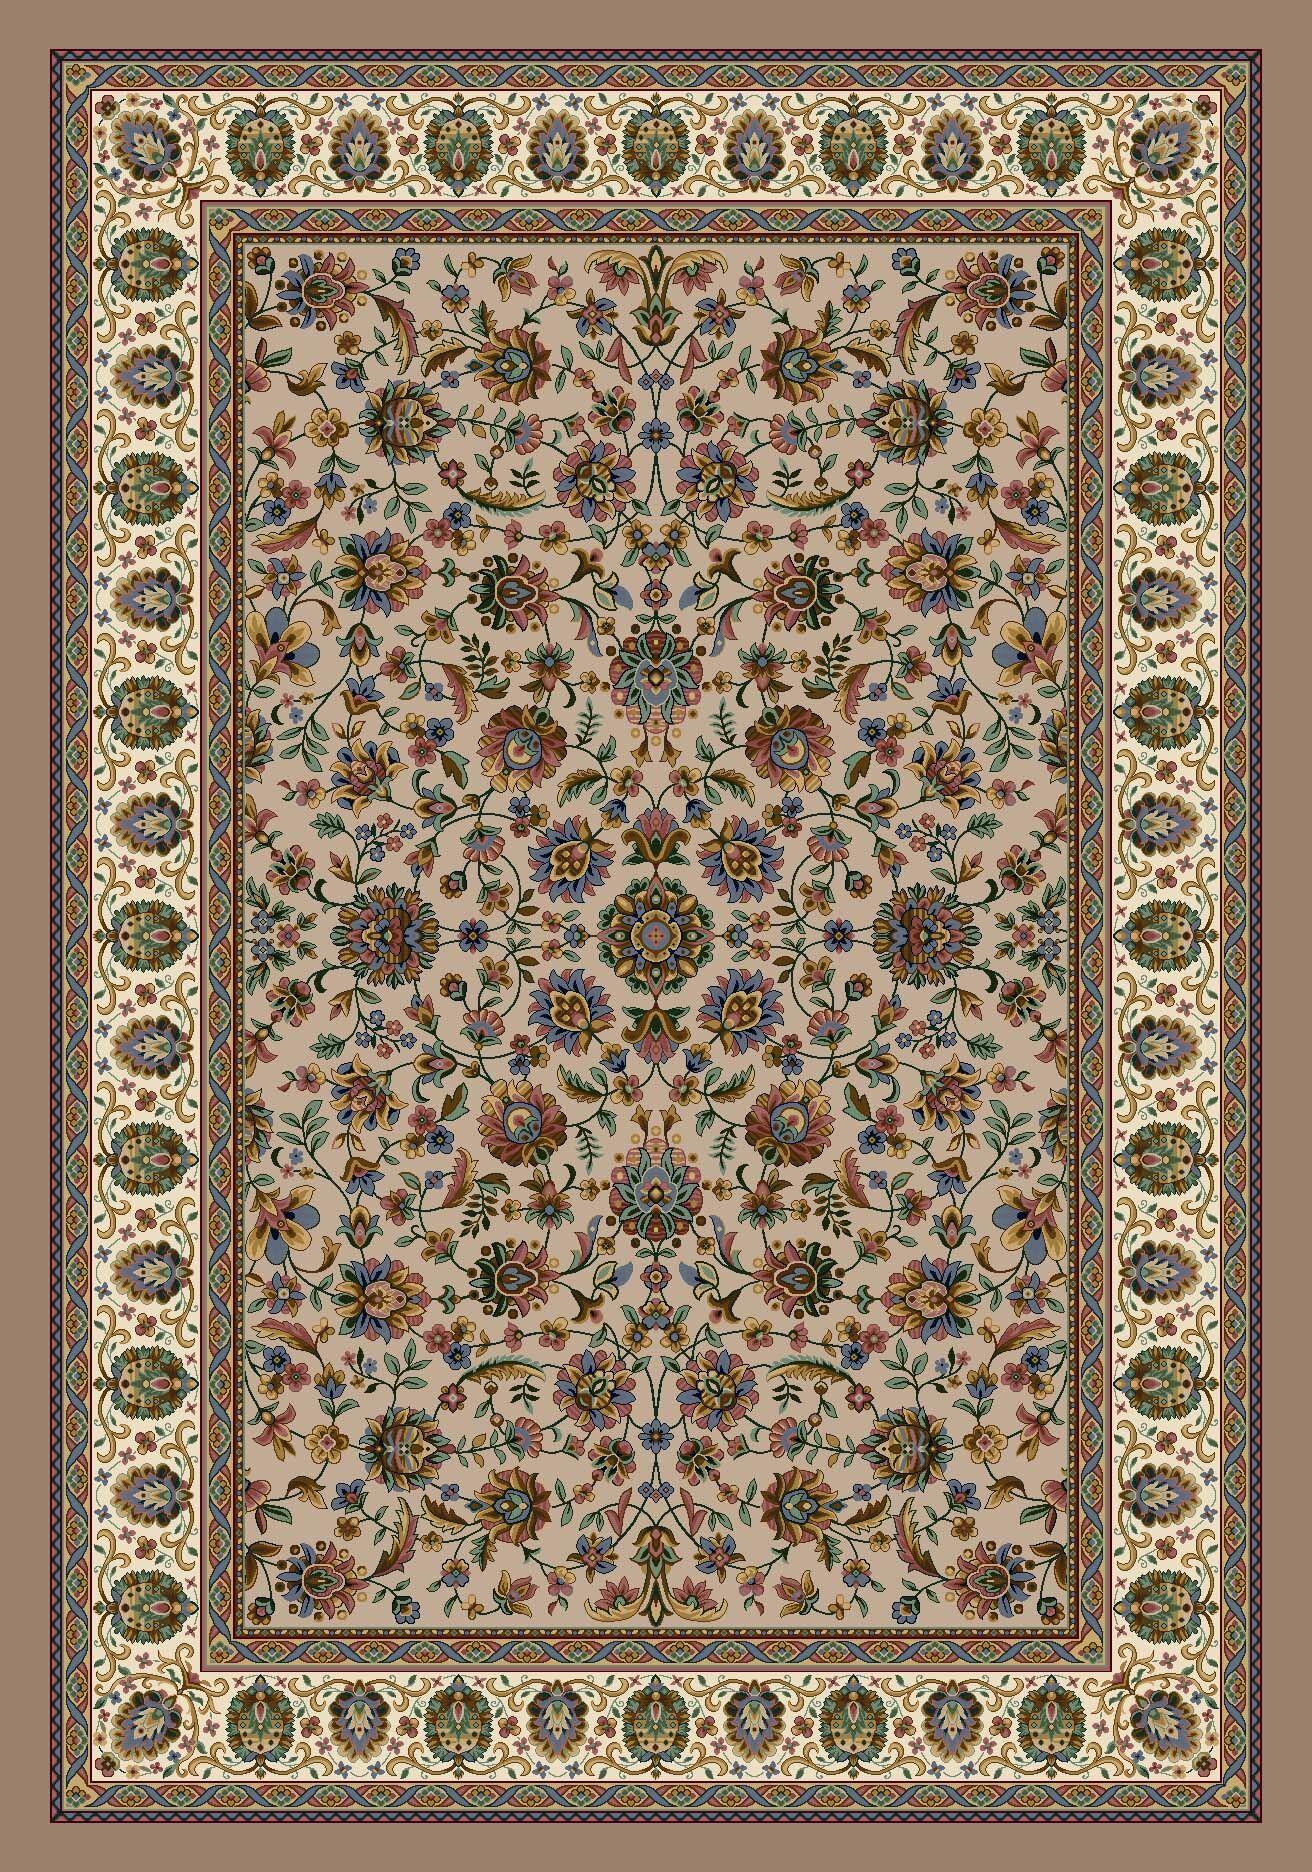 Signature Persian Palace Sandstone Area Rug Rug Size: Rectangle 3'10